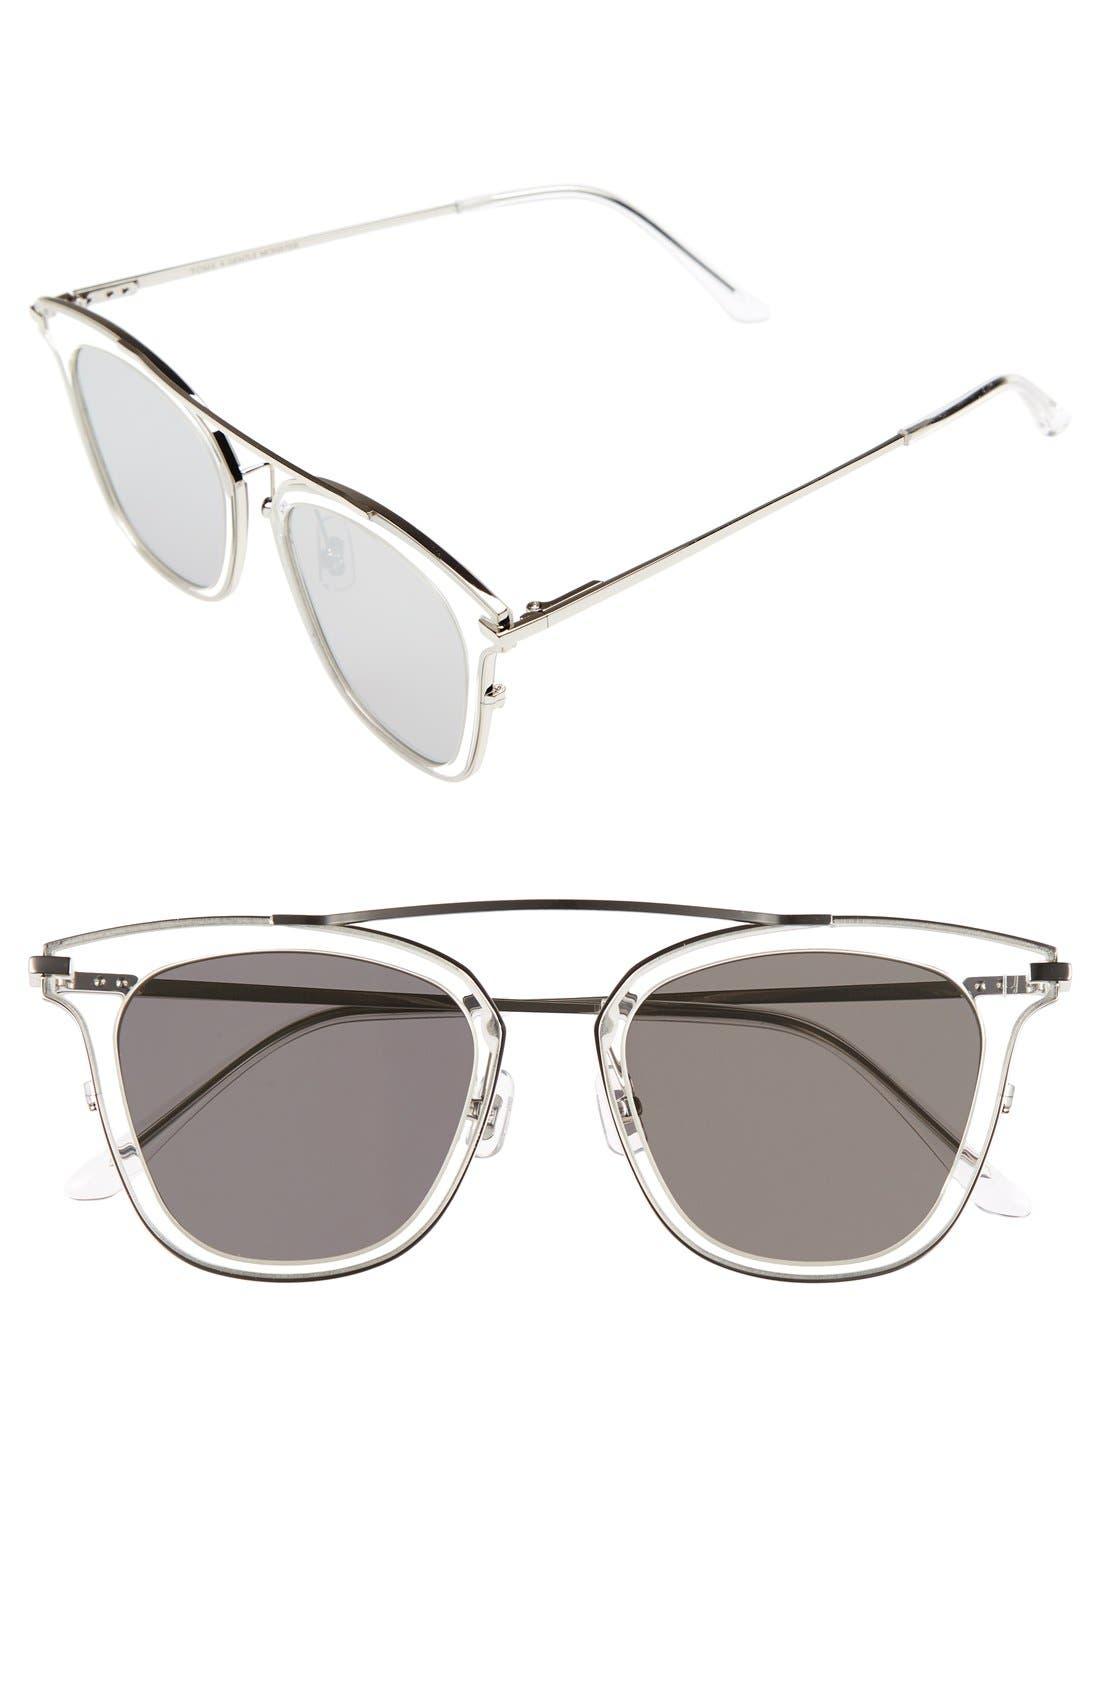 GENTLE MONSTER TOME x Gentle Monster Supernature 51mm Retro Sunglasses, Main, color, 040